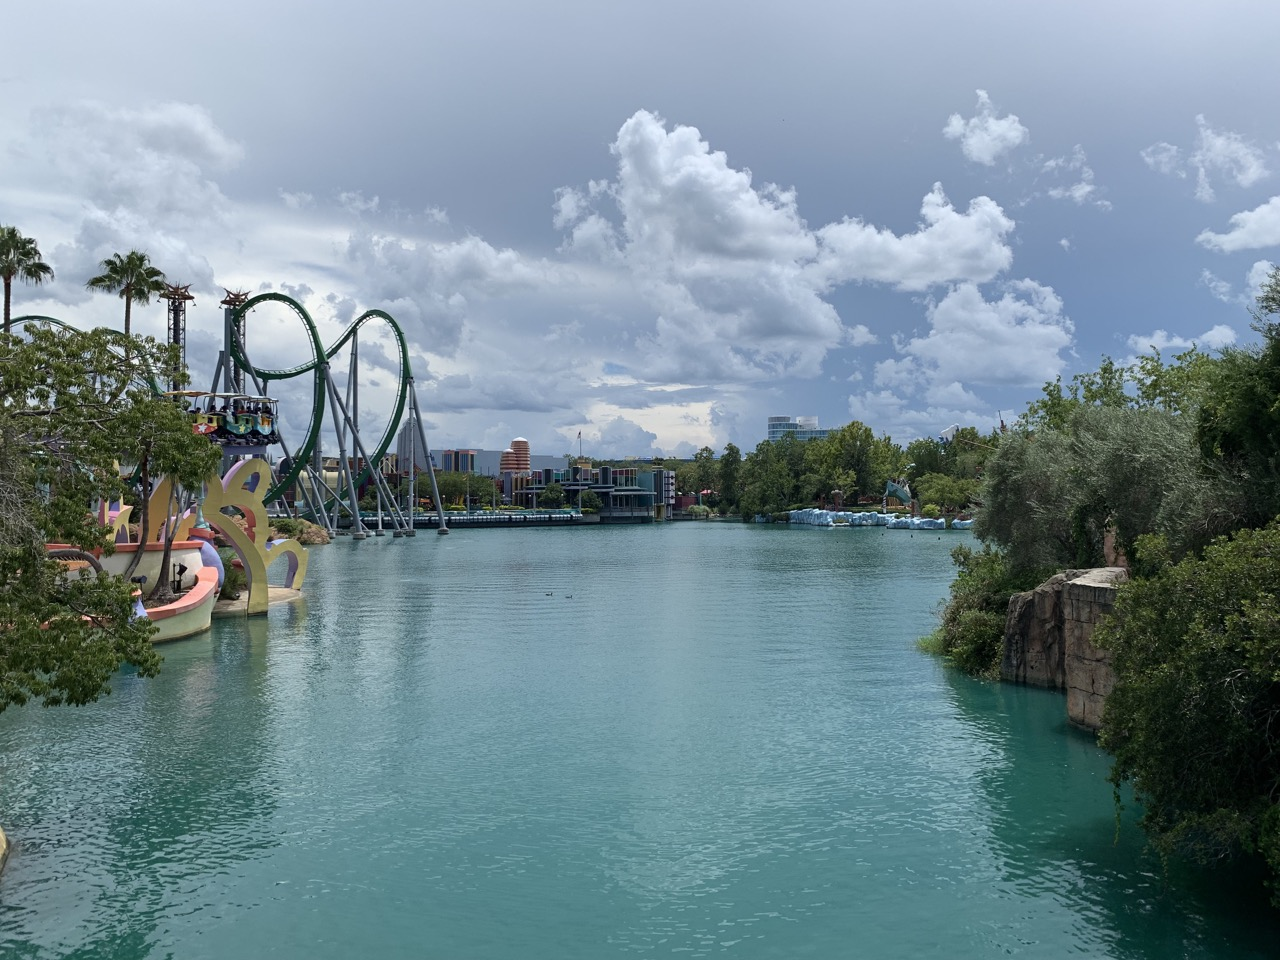 universal studios orlando trip vacation planinng guide 14 park.jpeg